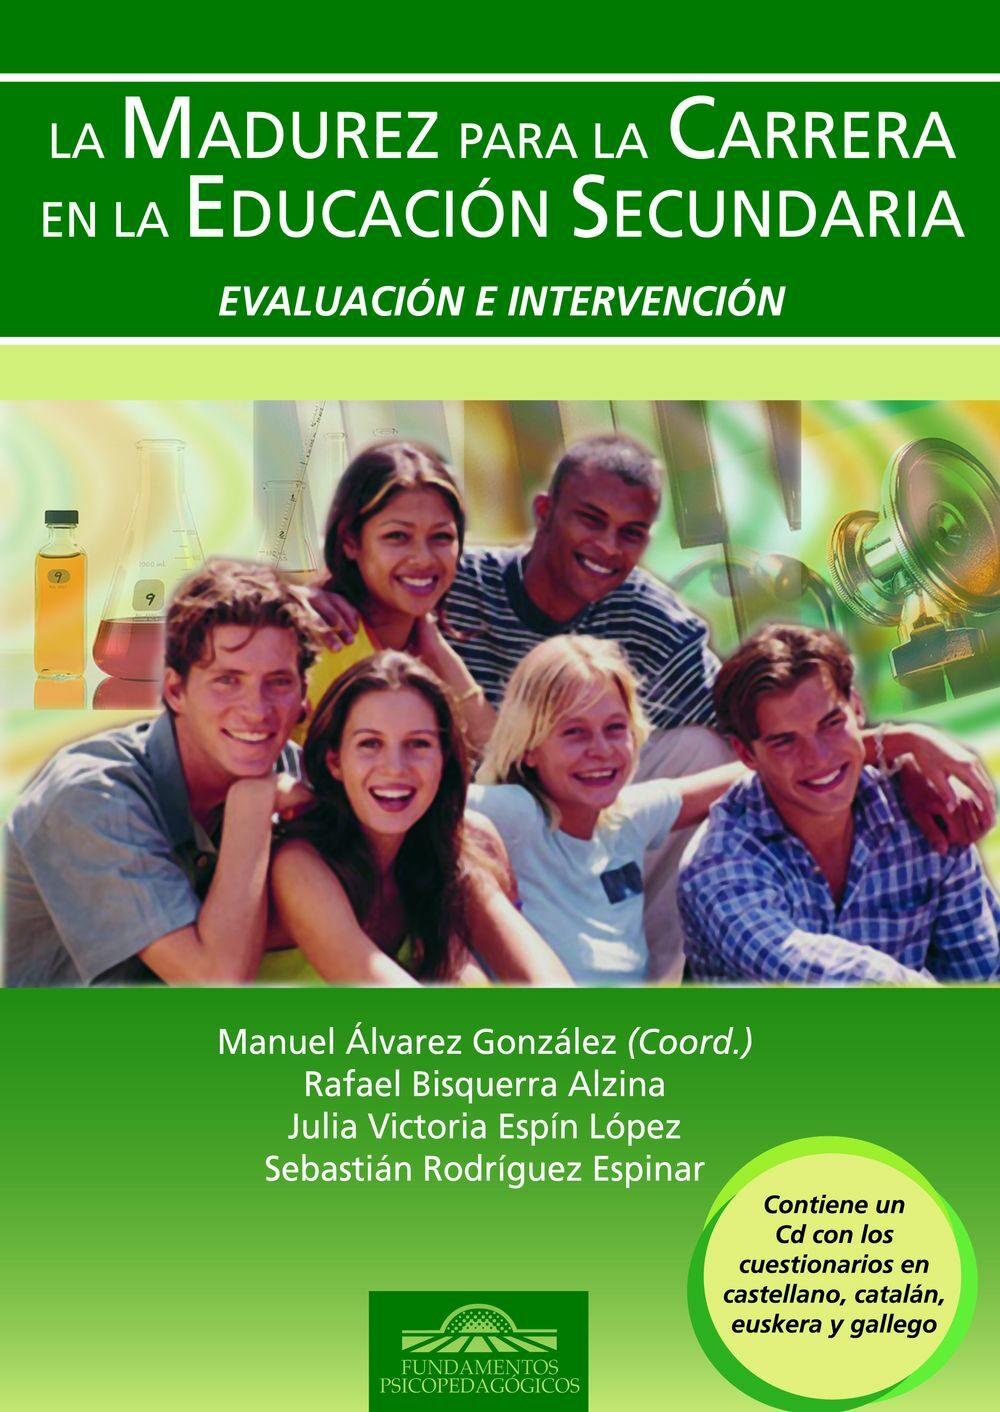 La Madurez Para La Carrera En La Educacion Secundaria. Evaluacion E Intervencion ( Contiene Cd ) por Manuel Alvarez Gonzalez epub